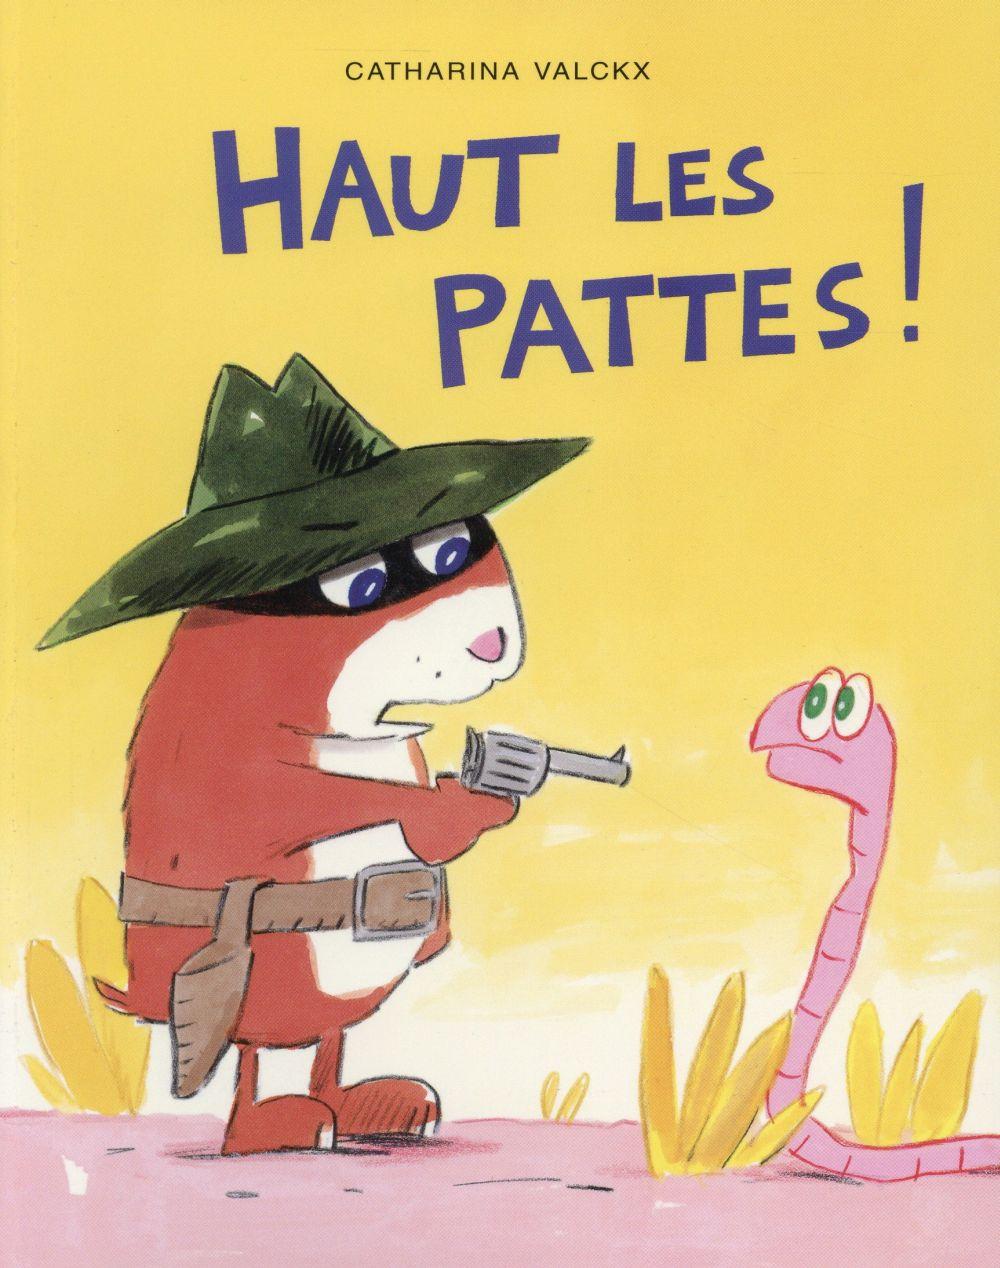 VALCKX CATHARINA - HAUT LES PATTES !